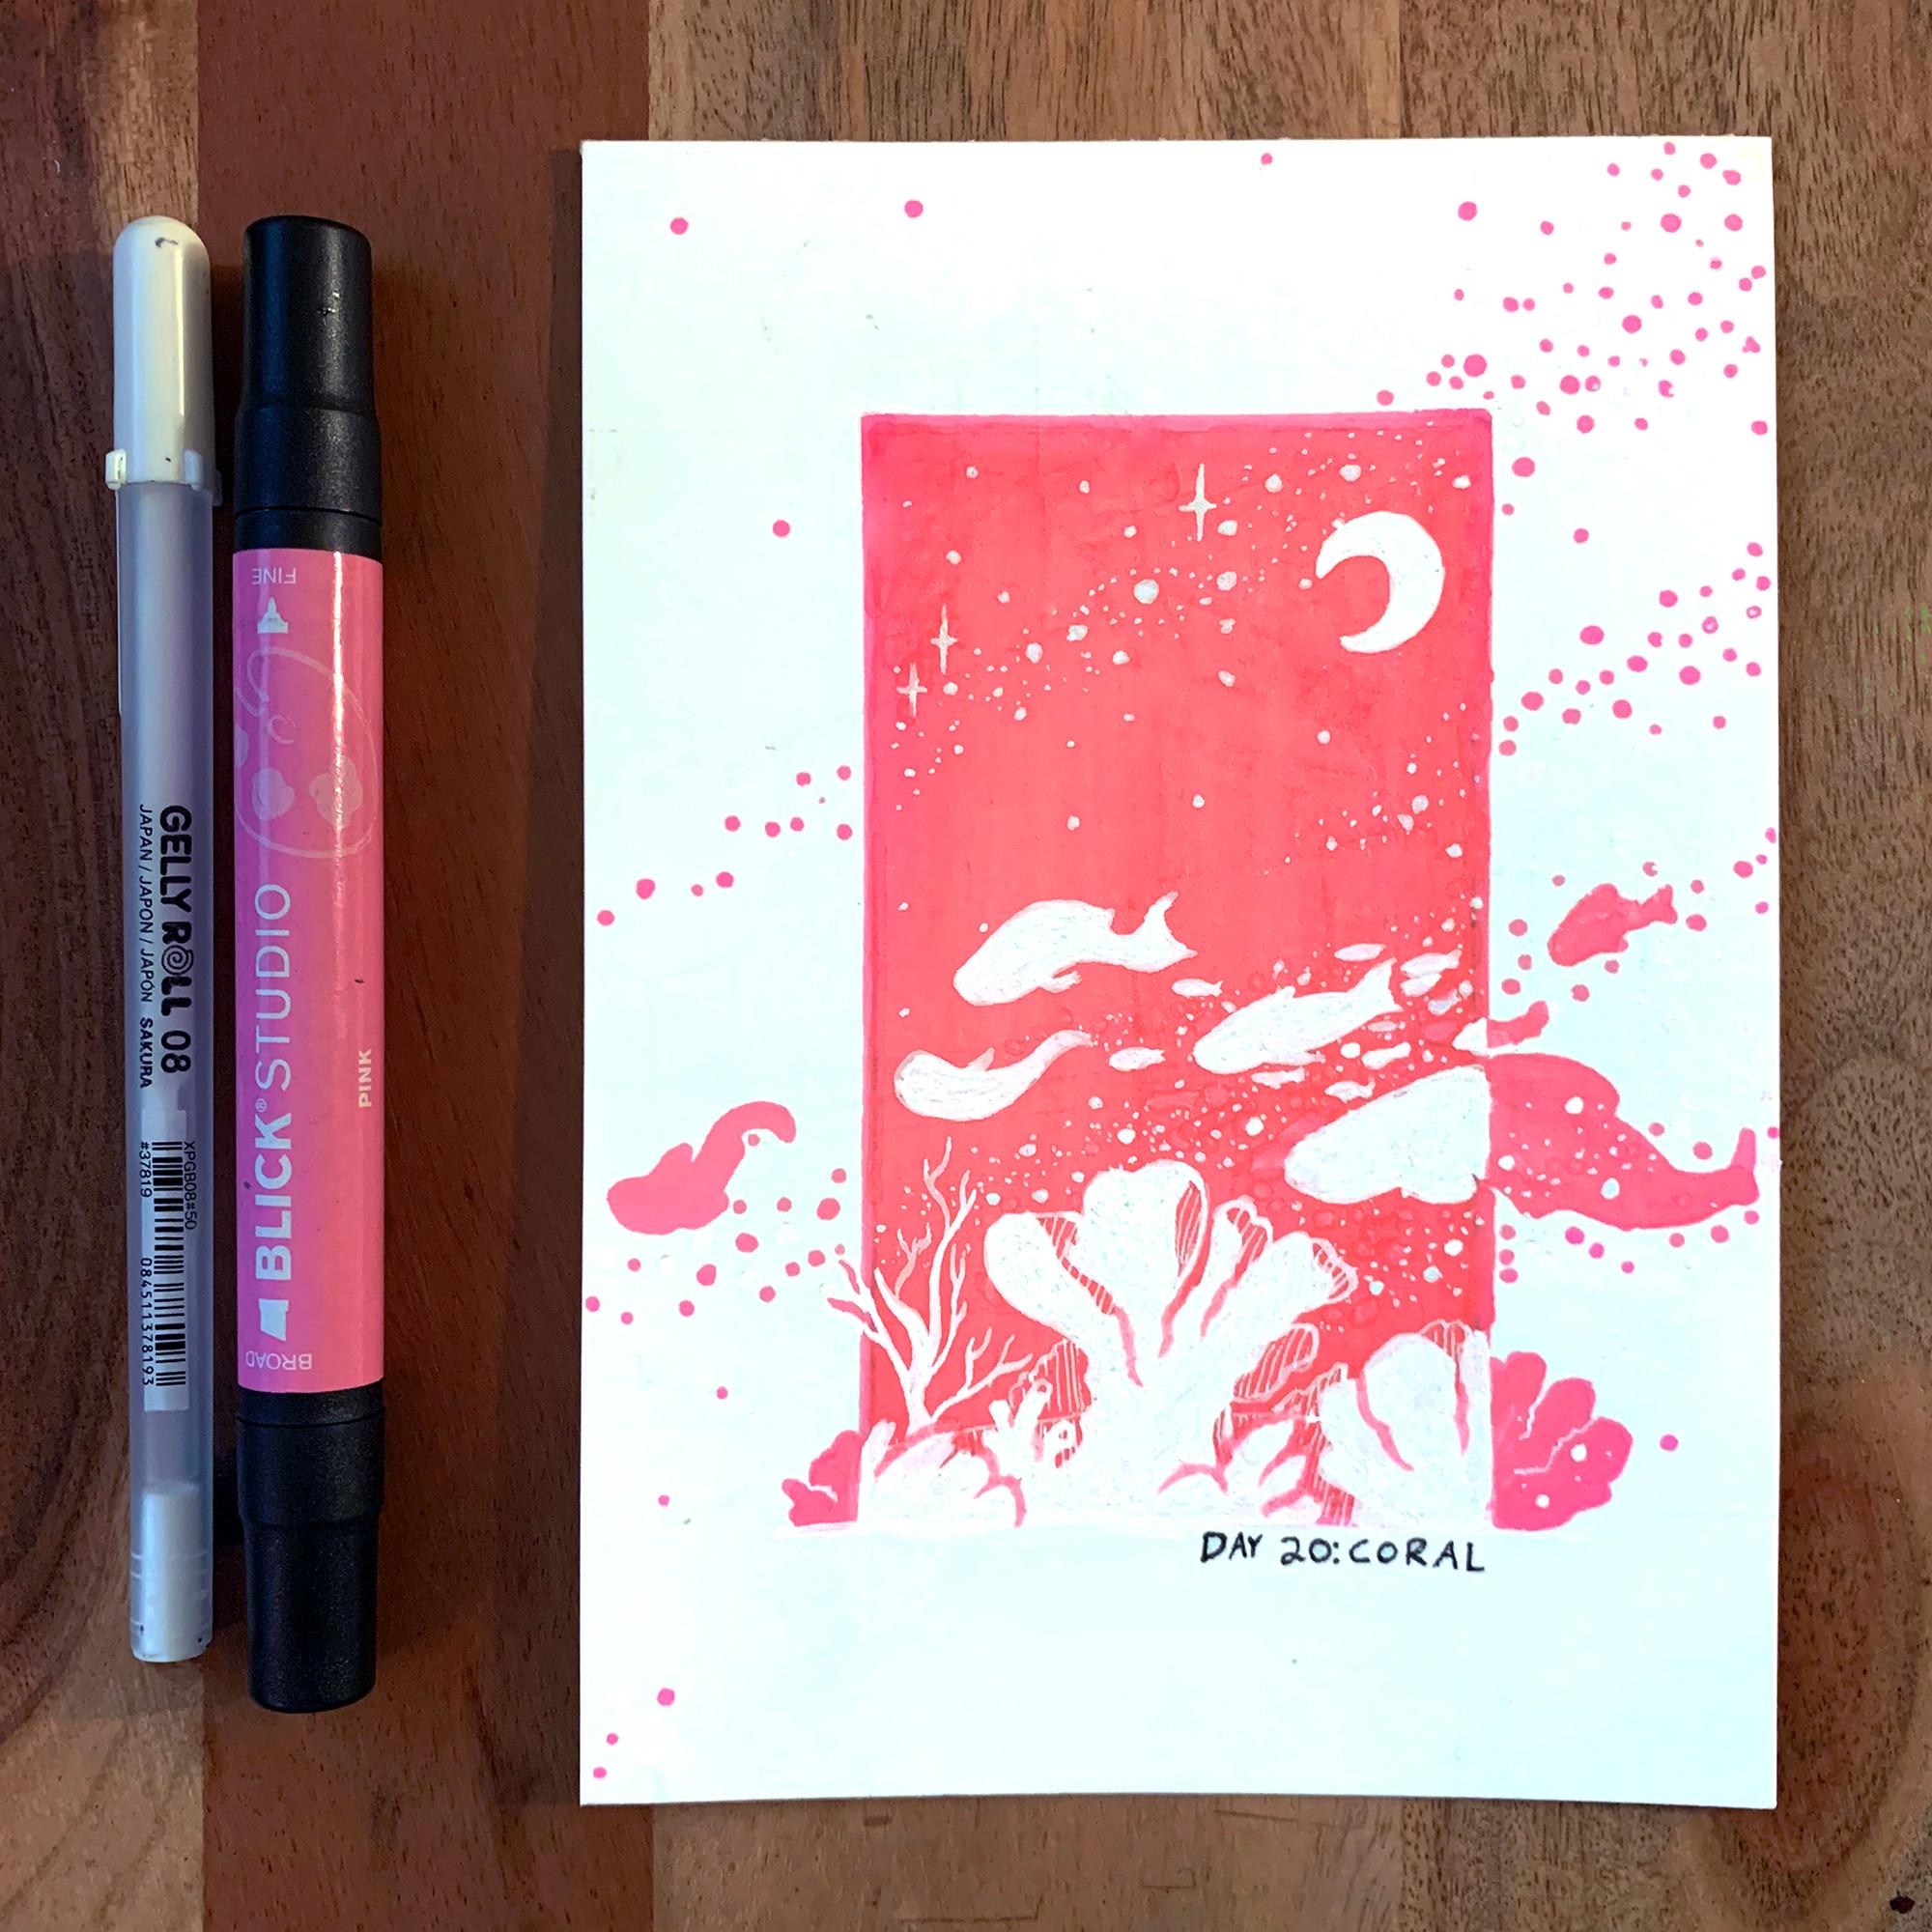 (Day 20: Coral) Swimmin' on Starlight